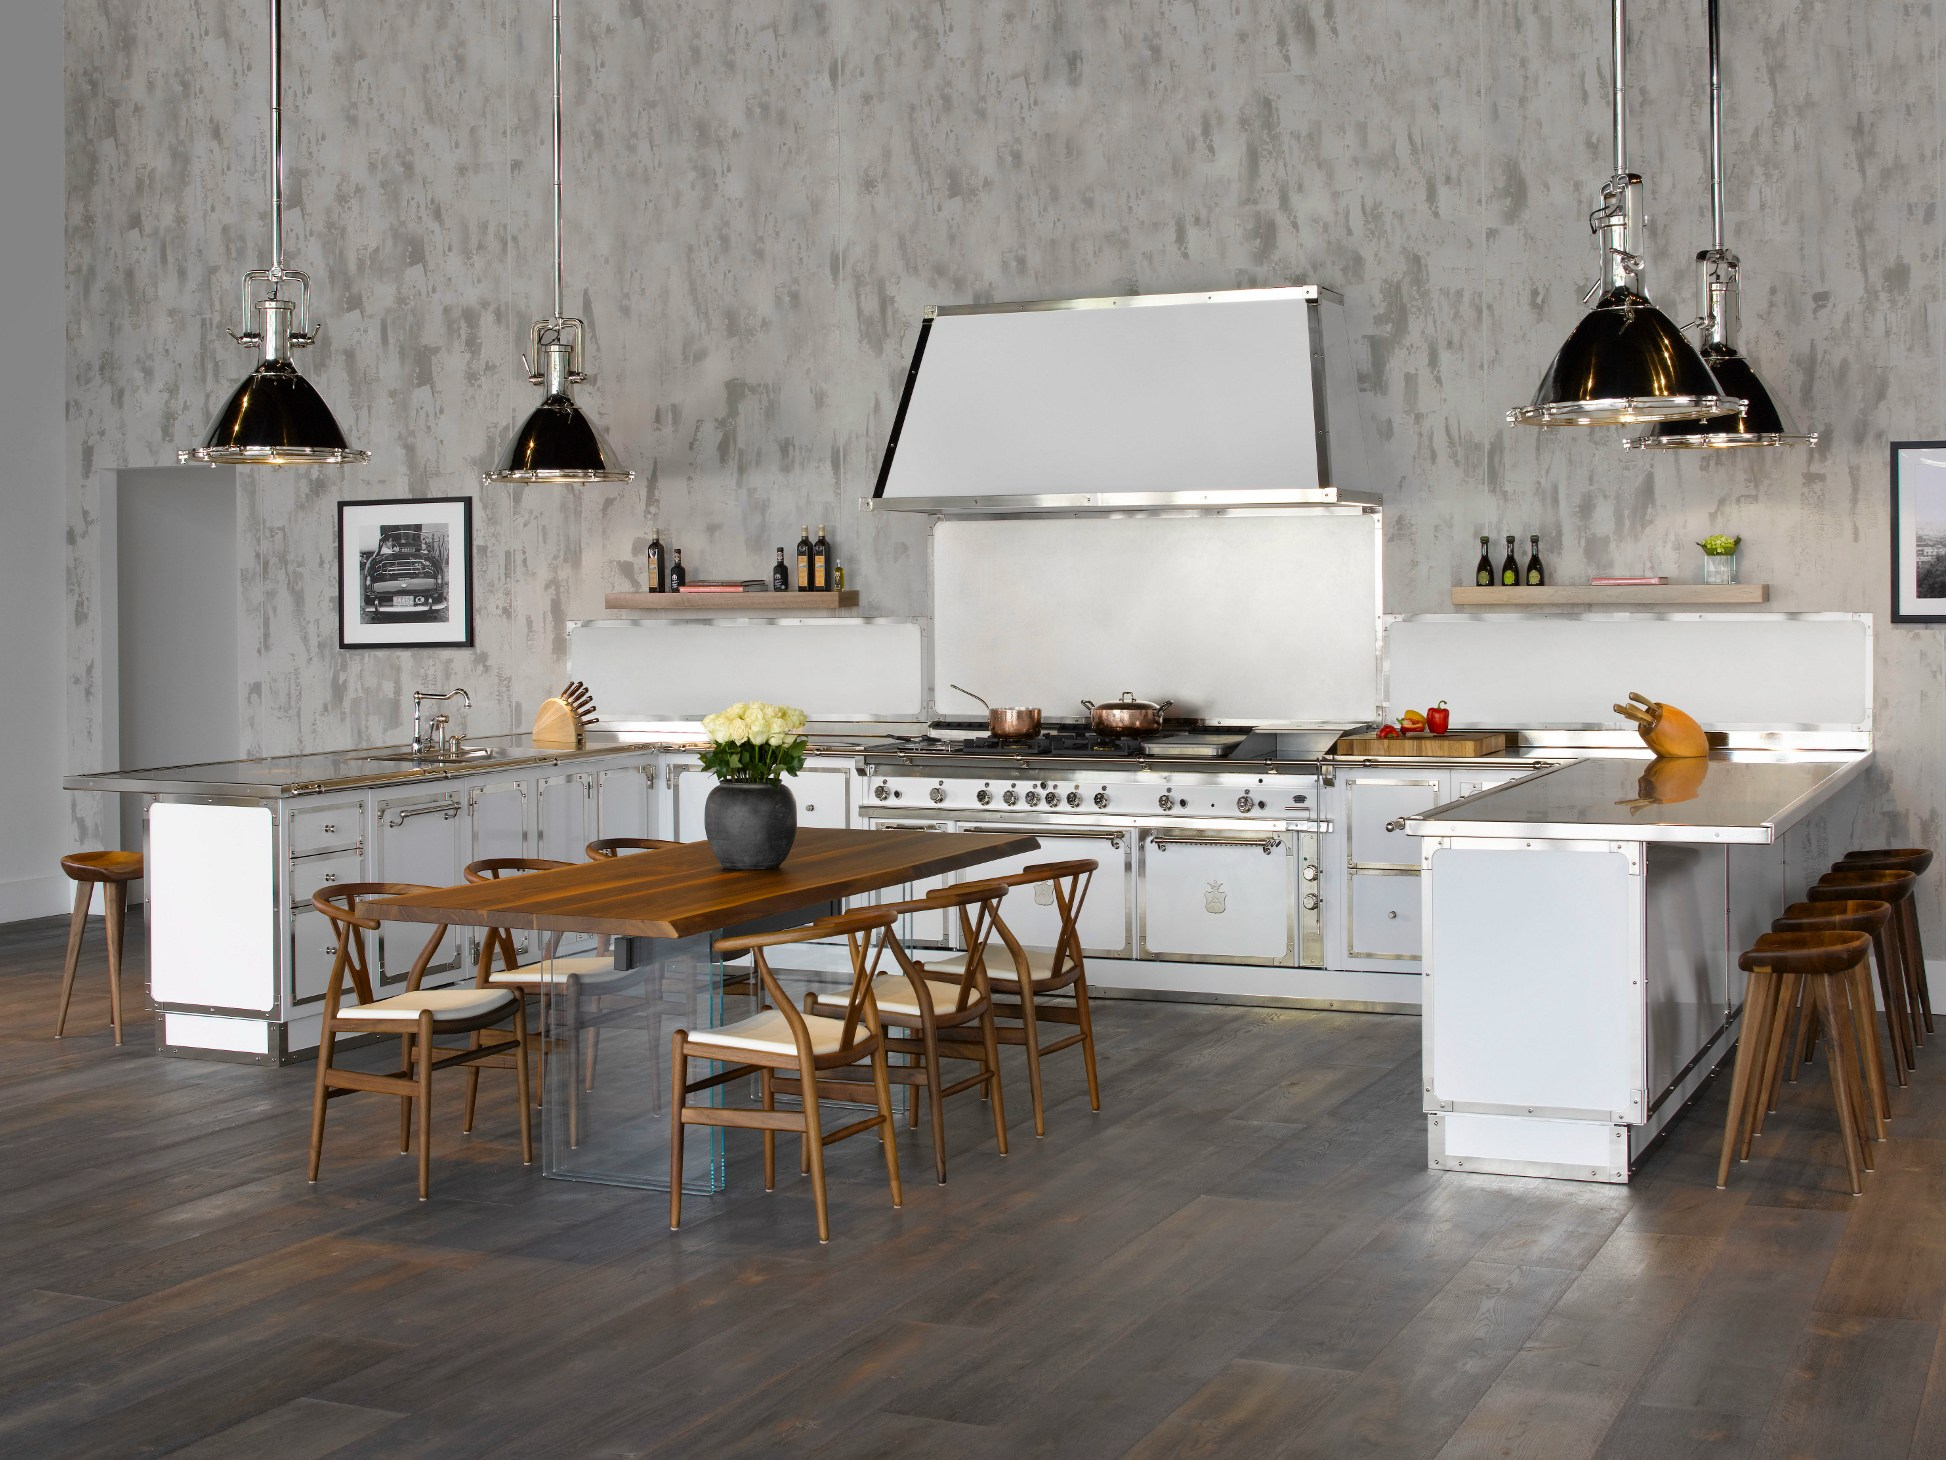 Cucina su misura PALM BEACH PALACE by Officine Gullo